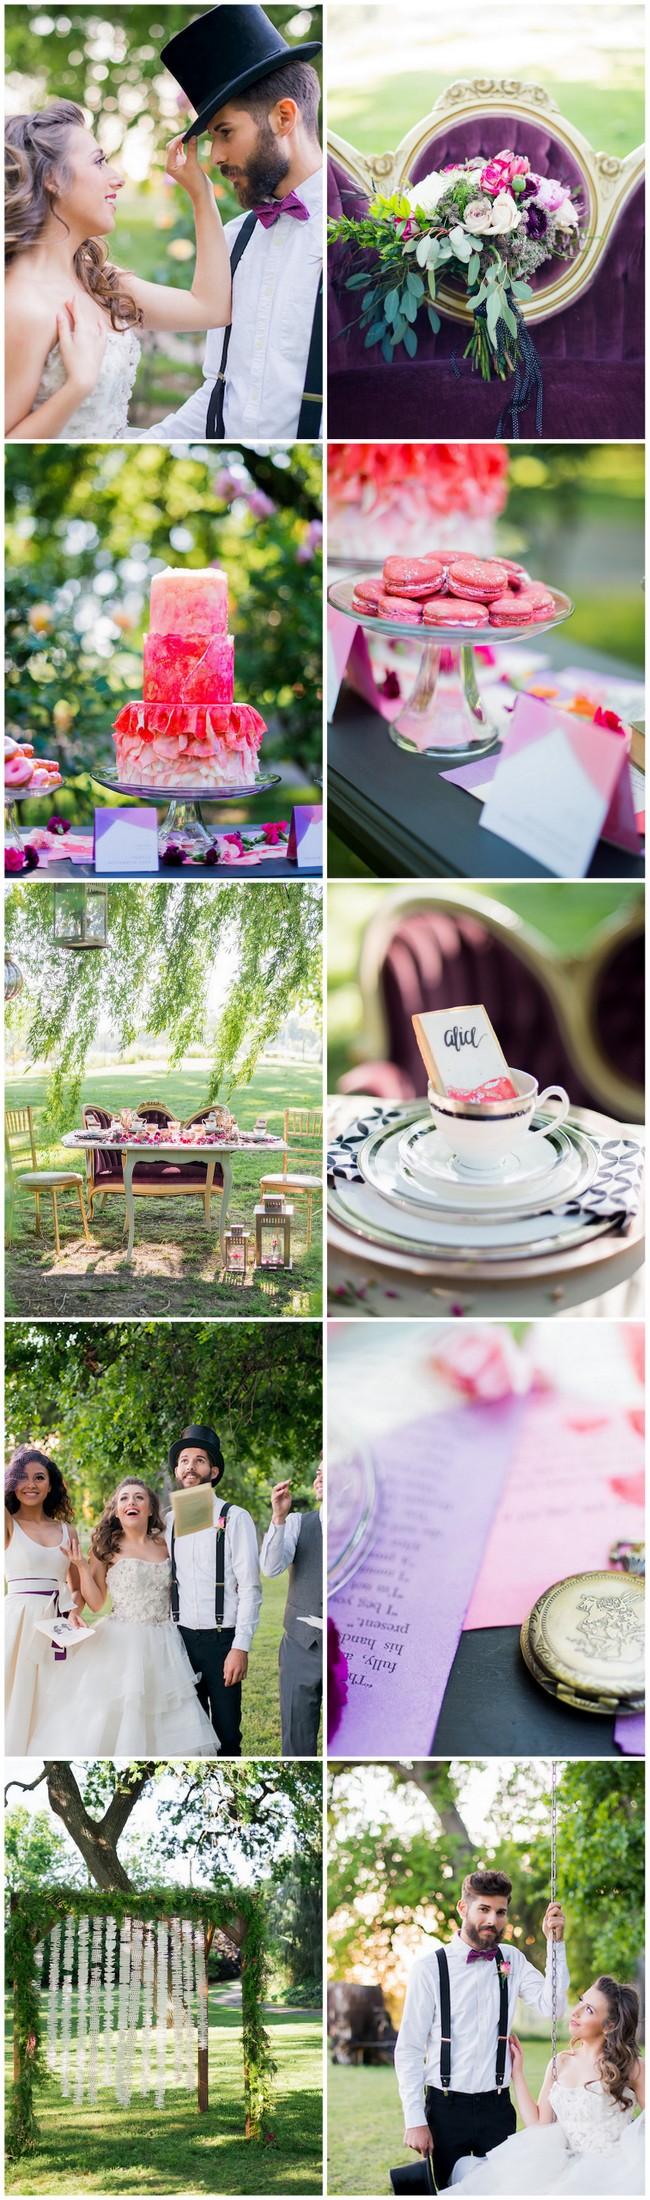 Creative + Dreamy Alice in Wonderland Garden #Wedding Ideas. Just follow the white rabbit! Pics: @kellymariephoto Click for more ideas:  https://confettidaydreams.com/alice-in-wonderland-garden-wedding/ 